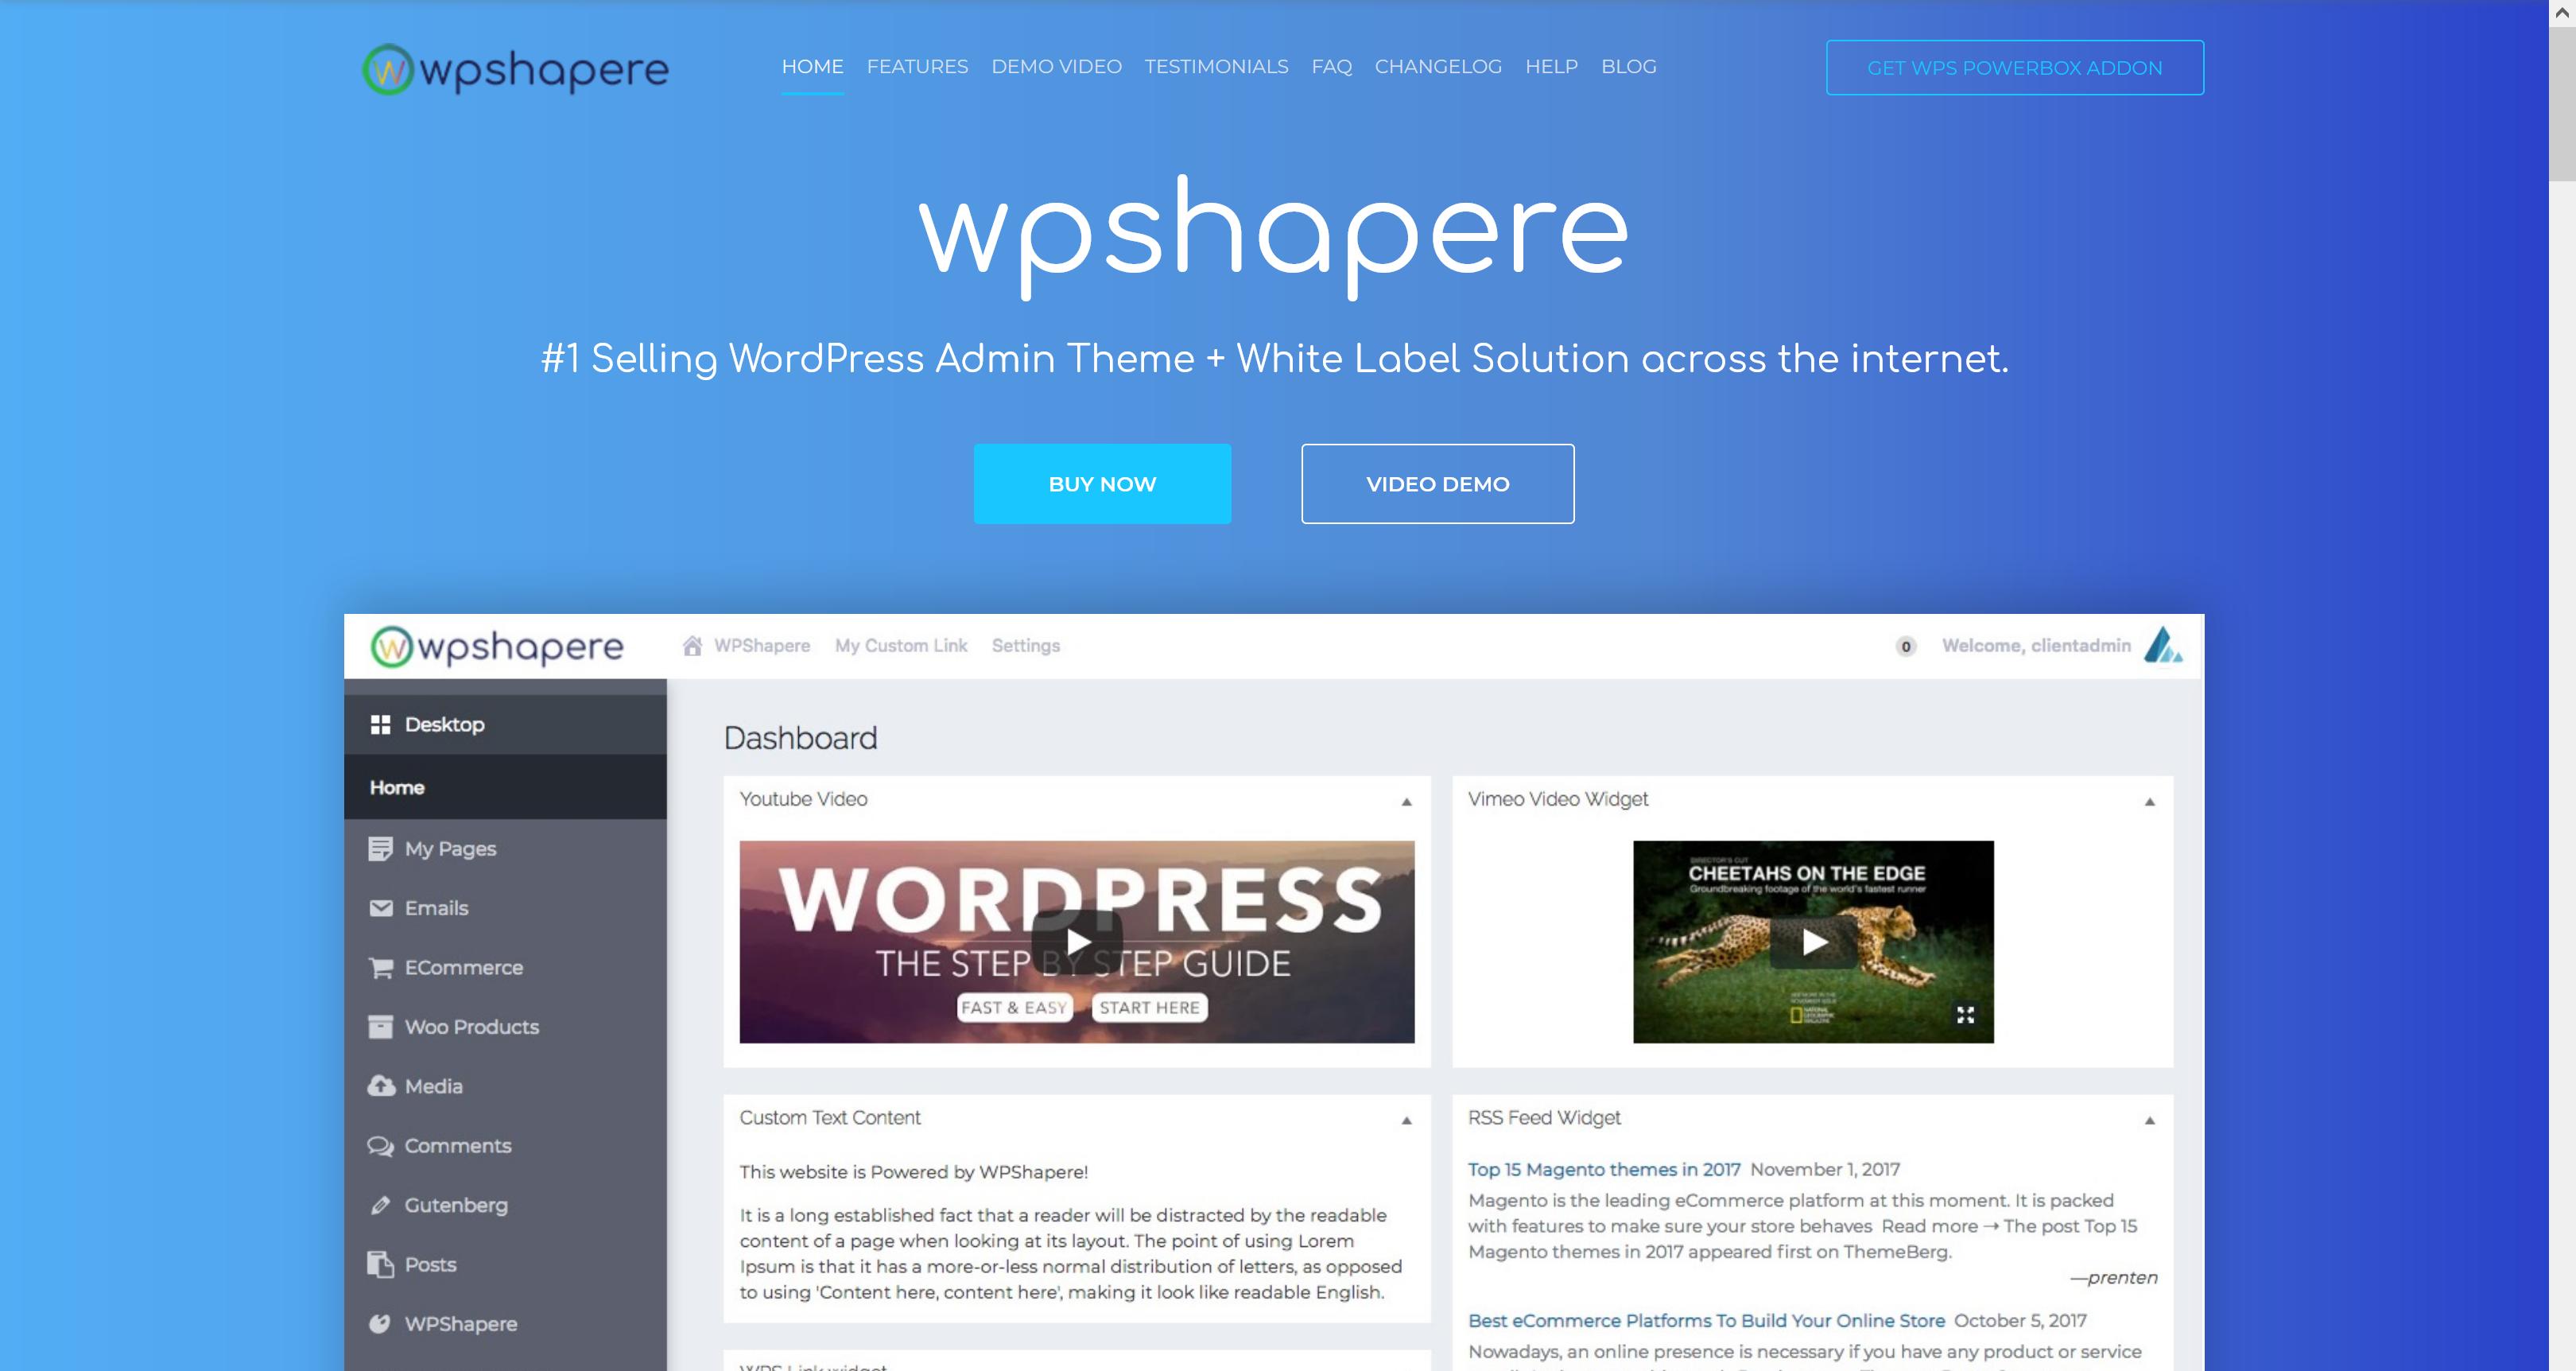 WPShapere 6.1.15 – WordPress Admin Theme